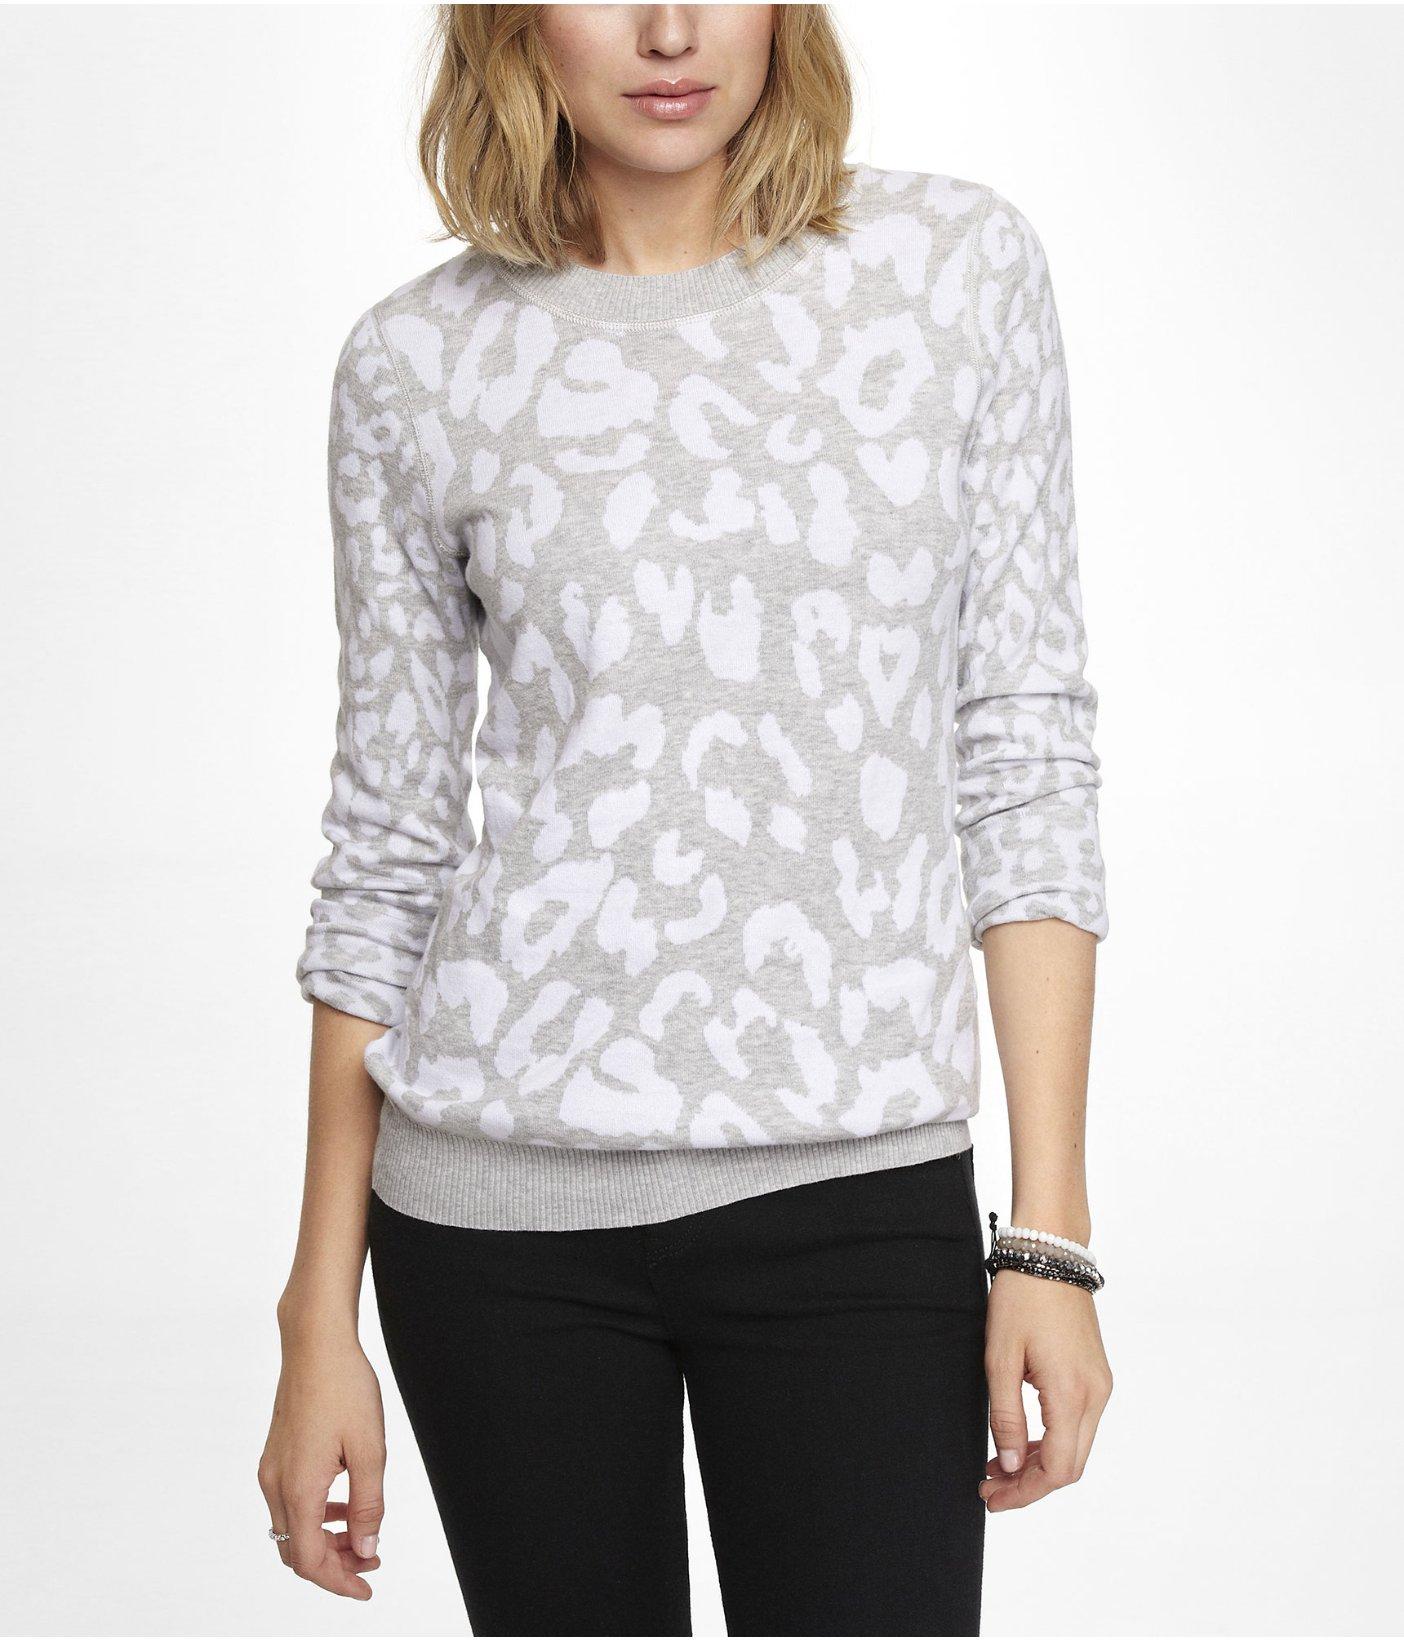 aae7155fd451 Express Reversible Leopard Jacquard Sweater in Gray - Lyst